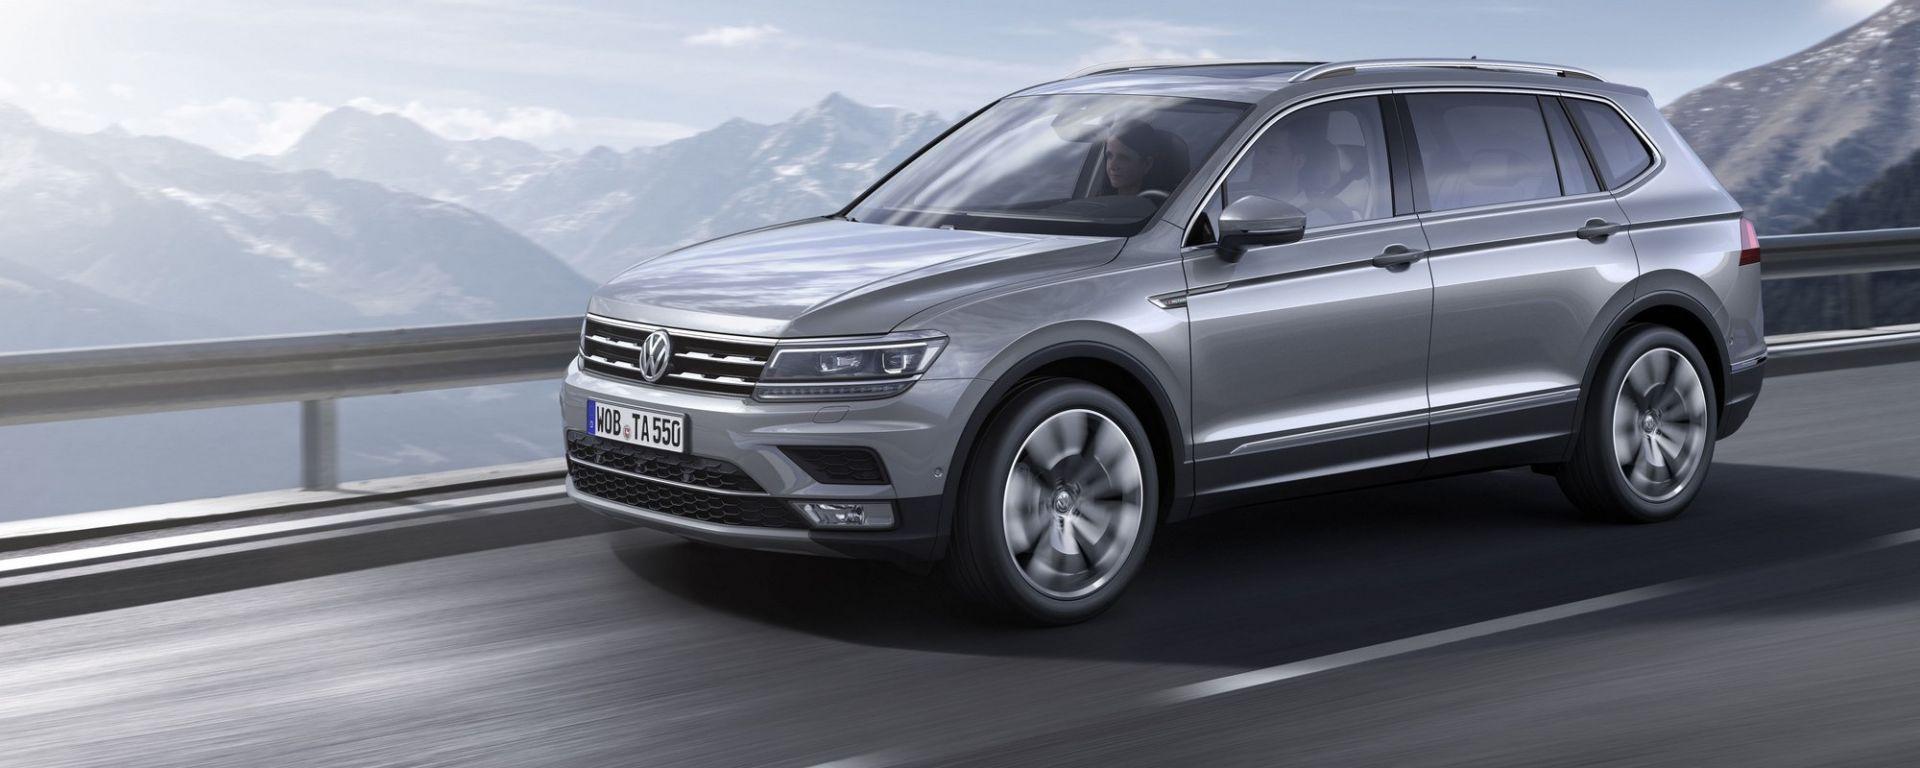 Volkswagen Tiguan Allspace: sbarca in Europa la Tiguan extralarge